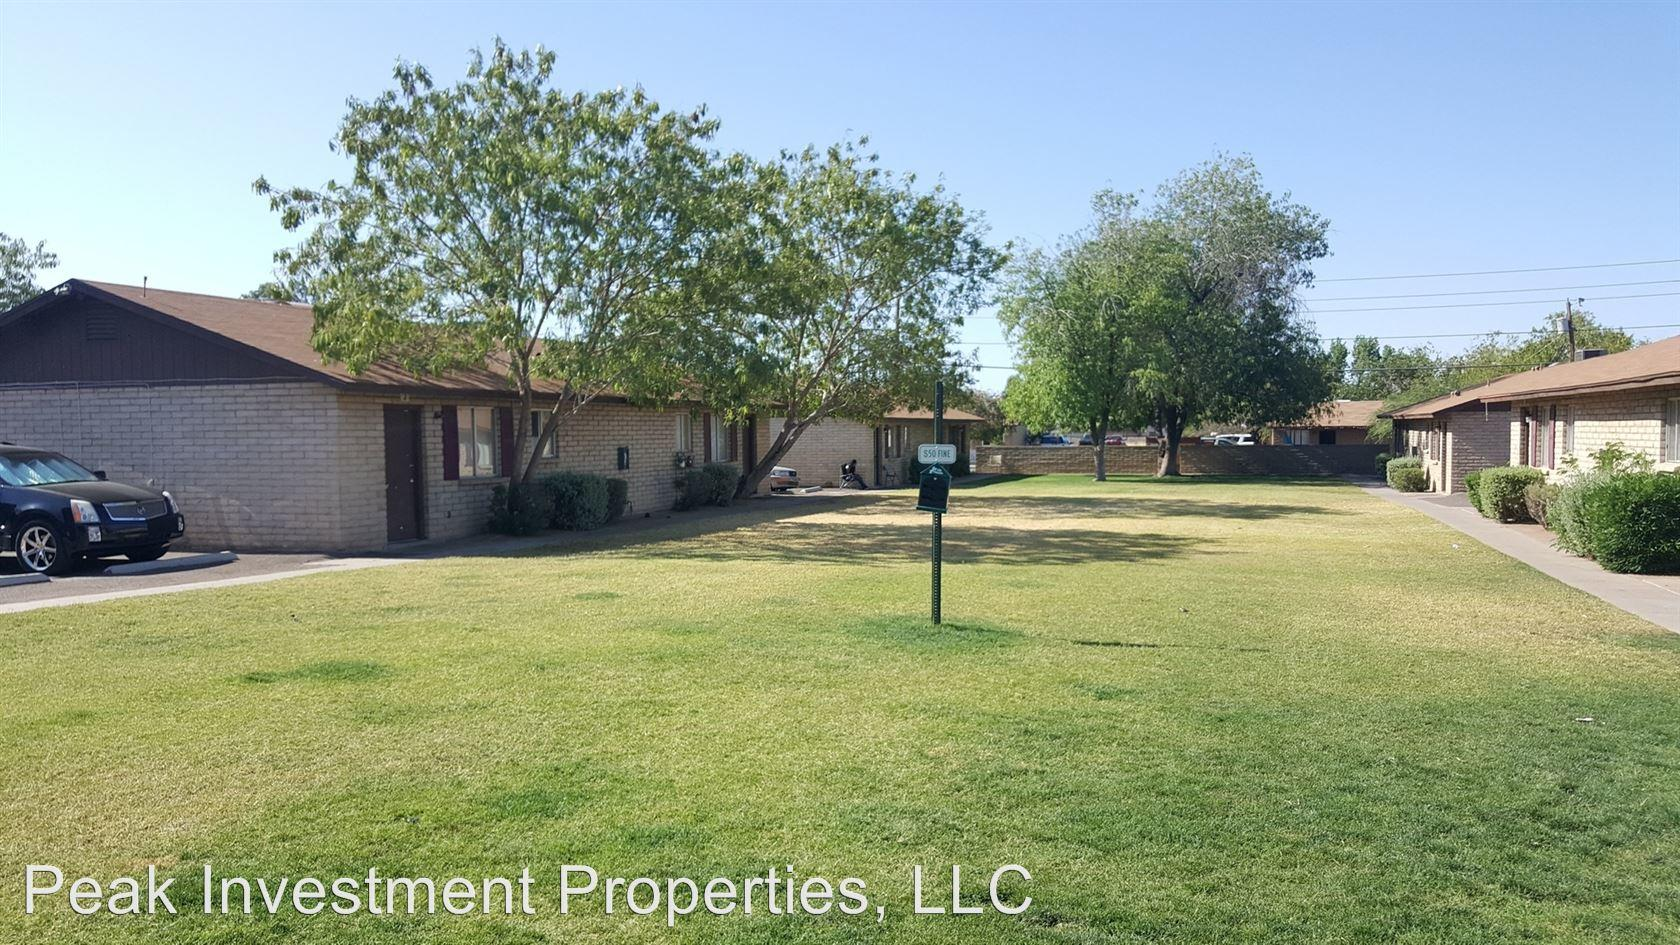 1626 W Desert Cove Ave Phoenix Az 85029 Multi Family